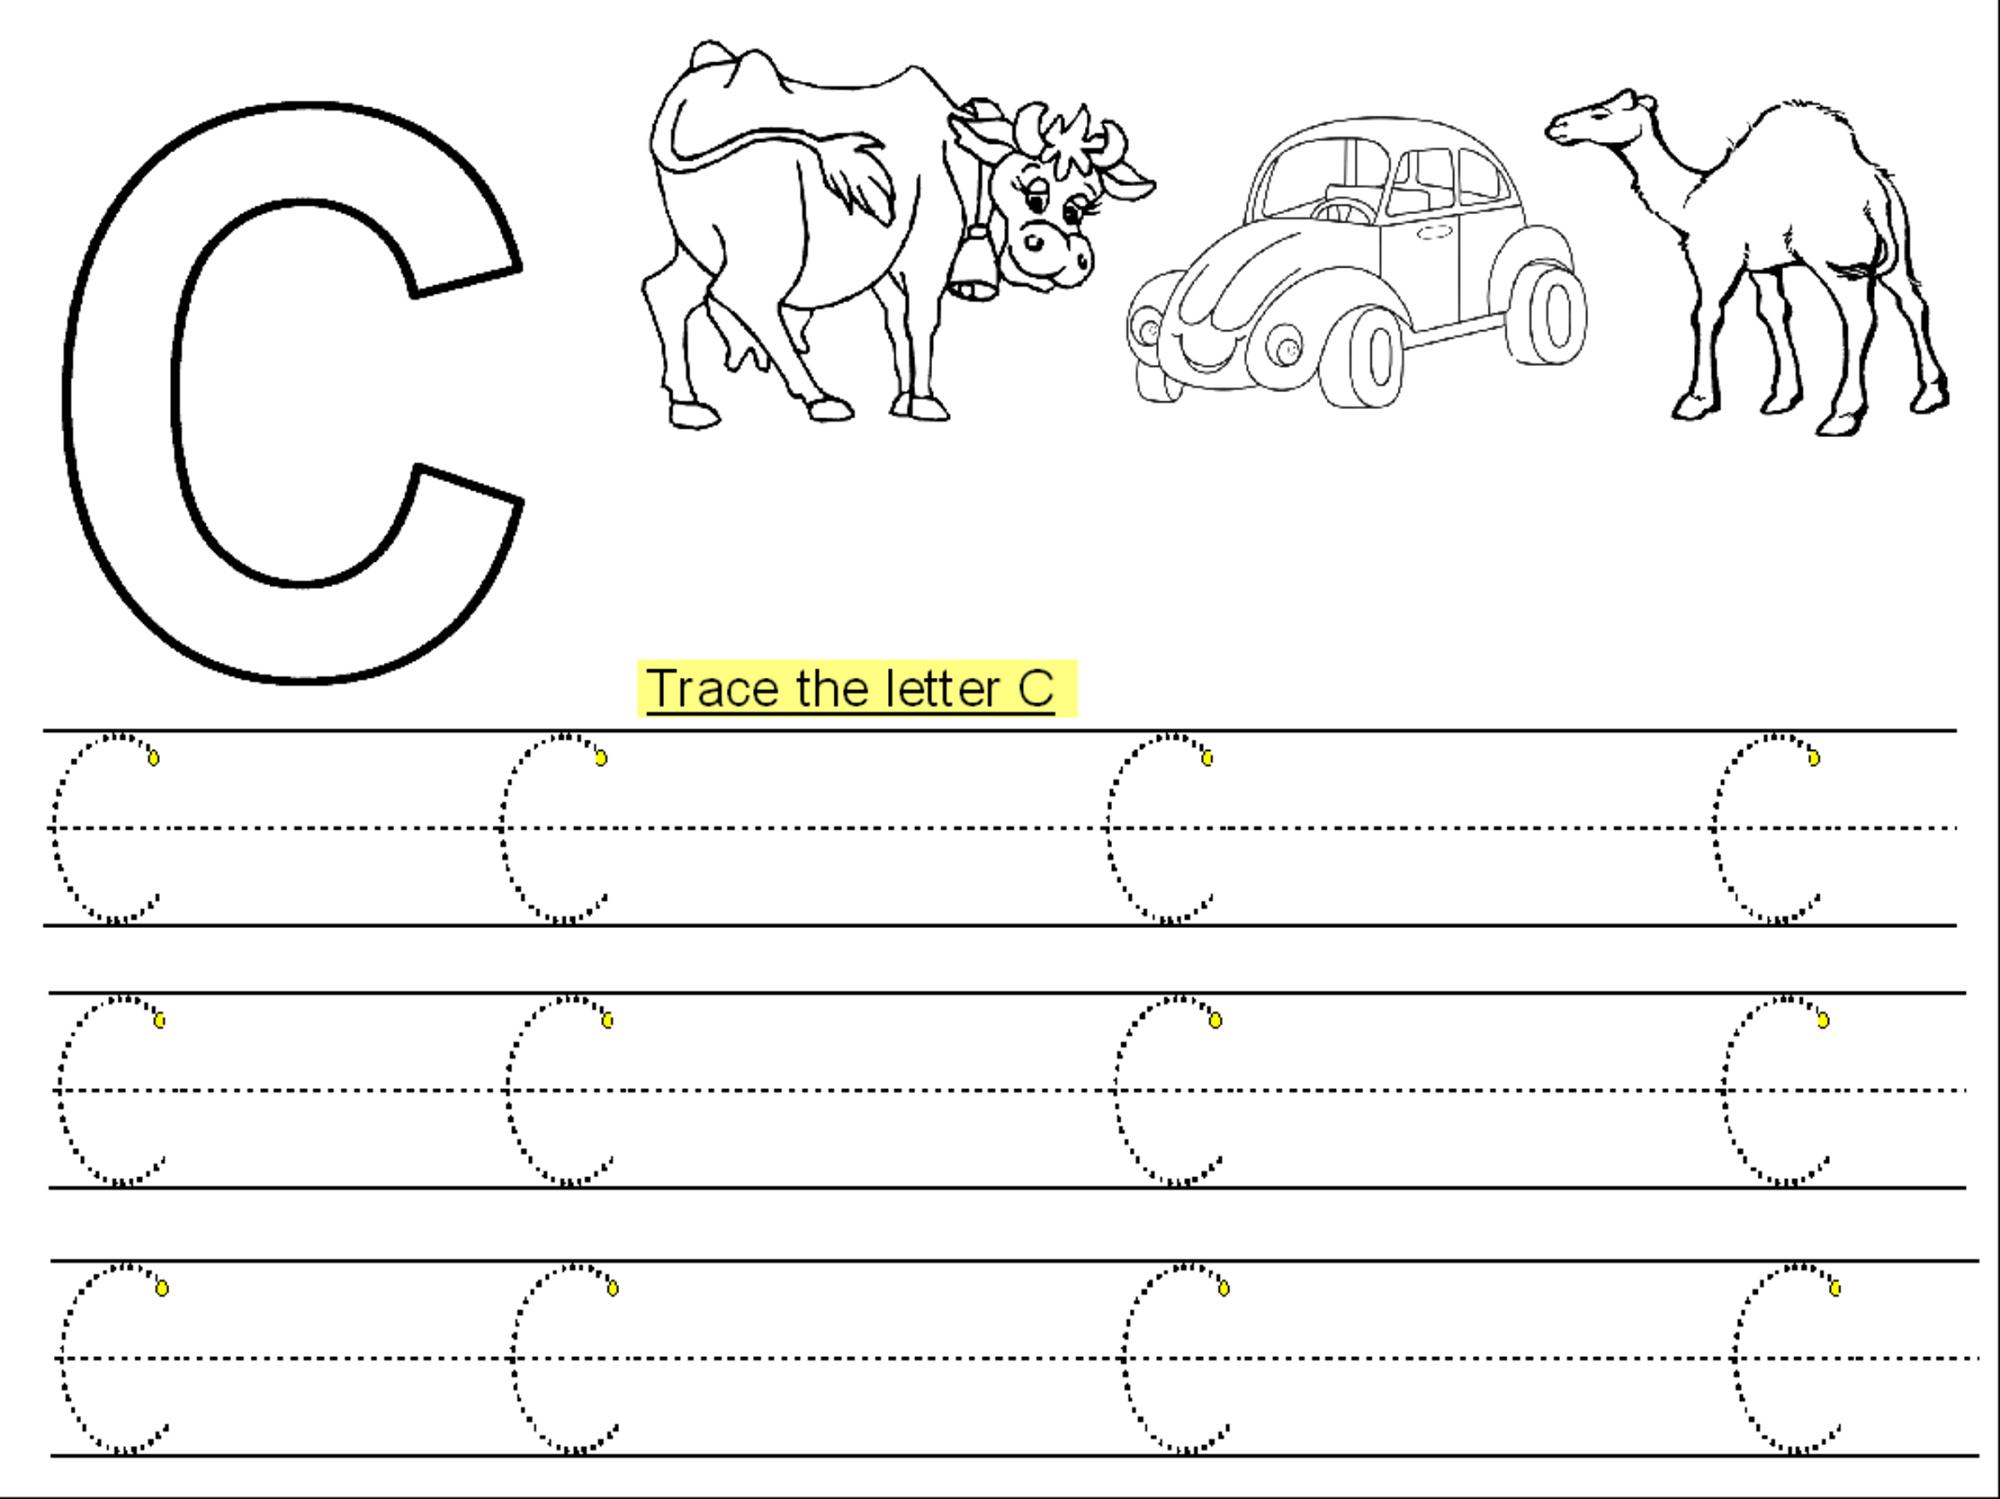 Trace Letter C Printable | Kiddo Shelter | Kids Worksheets Printable ...